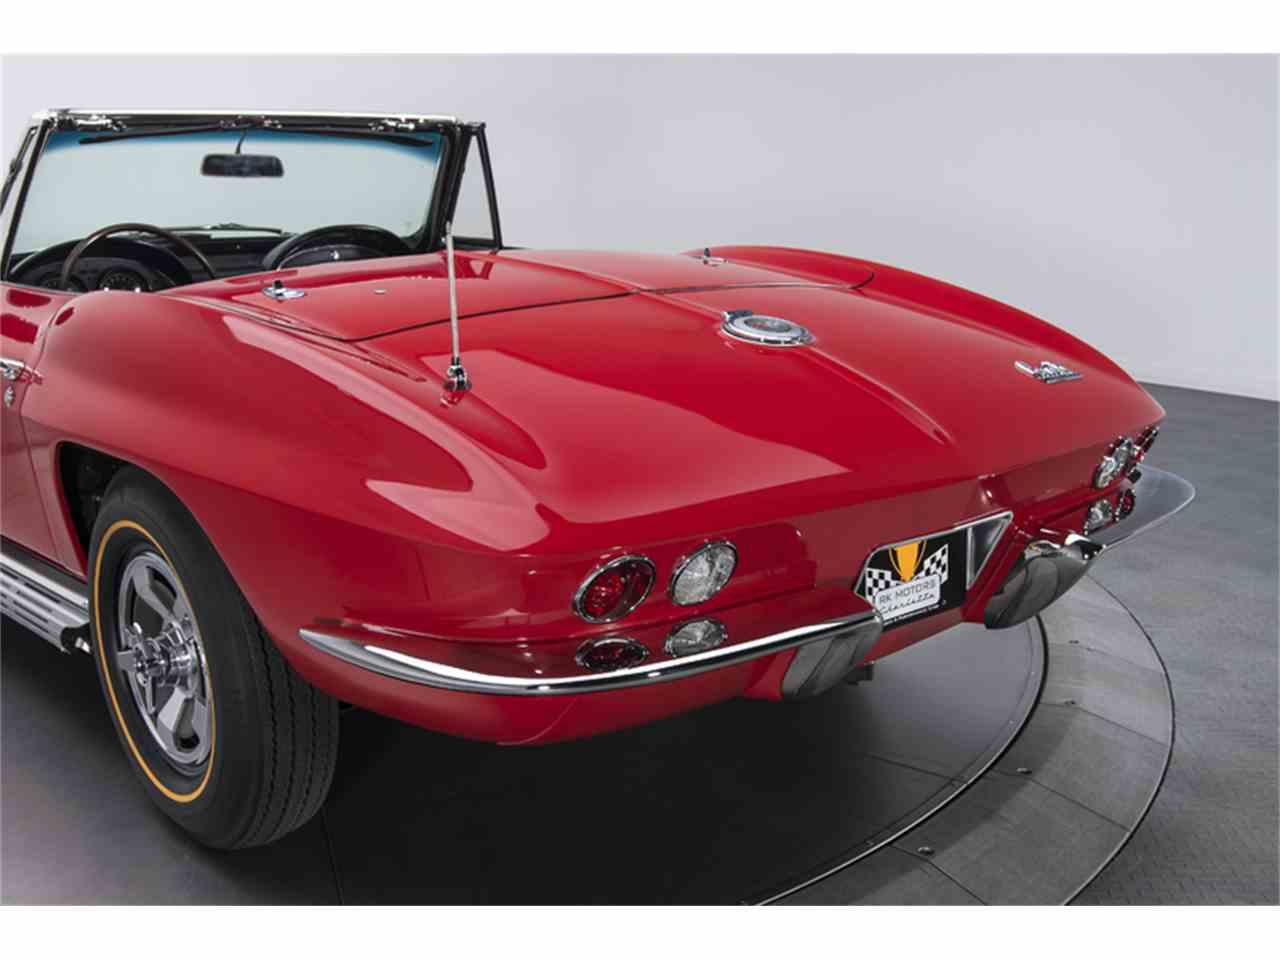 1966 Chevrolet Corvette Stingray For Sale Classiccars